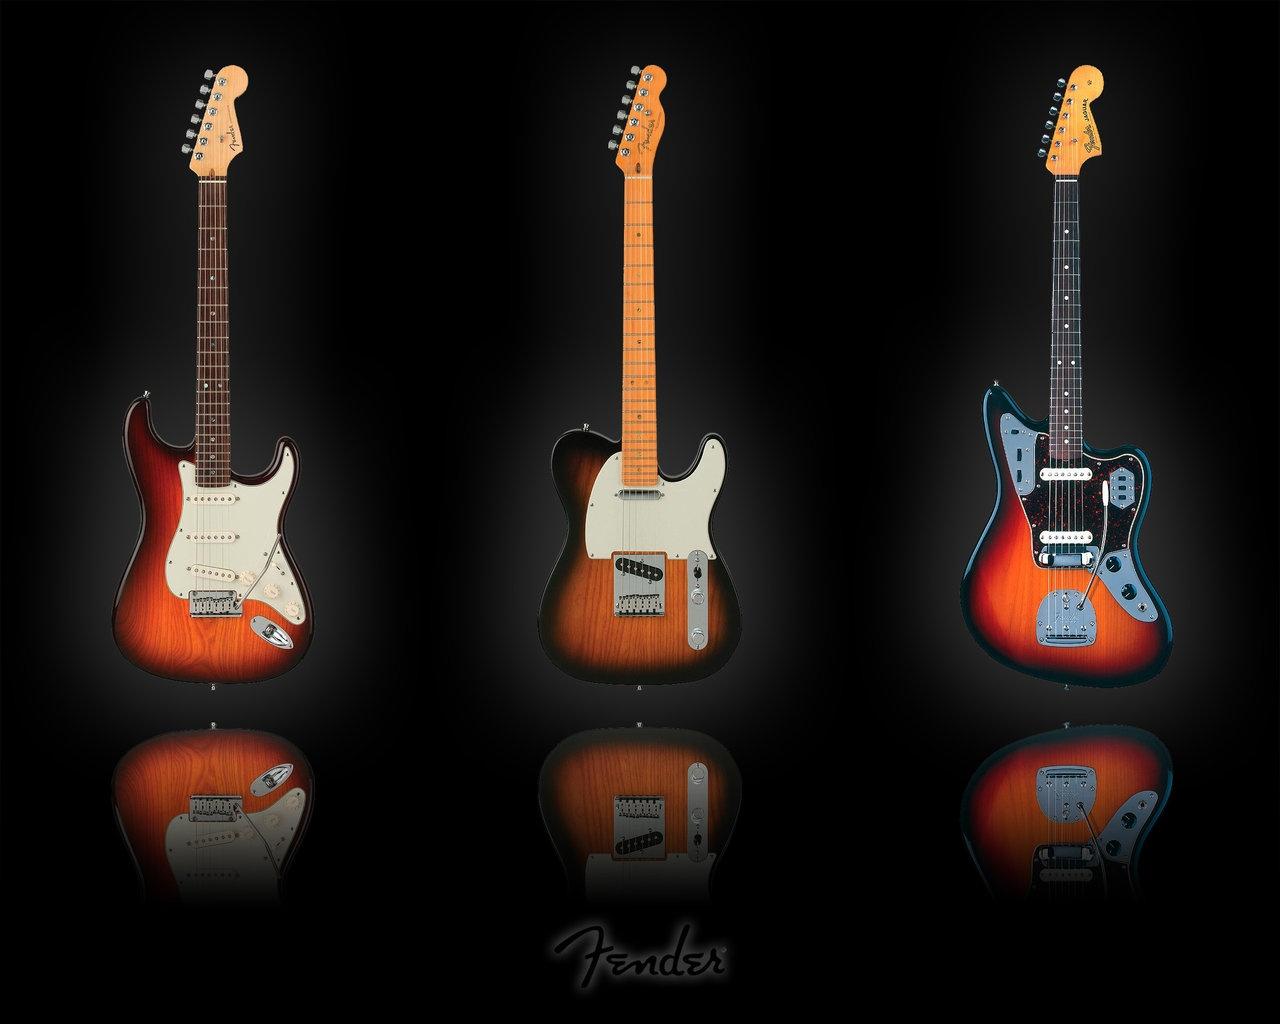 Guitar Fender Wallpaper 18202 Hd Wallpapers in Music   Imagescicom 1280x1024